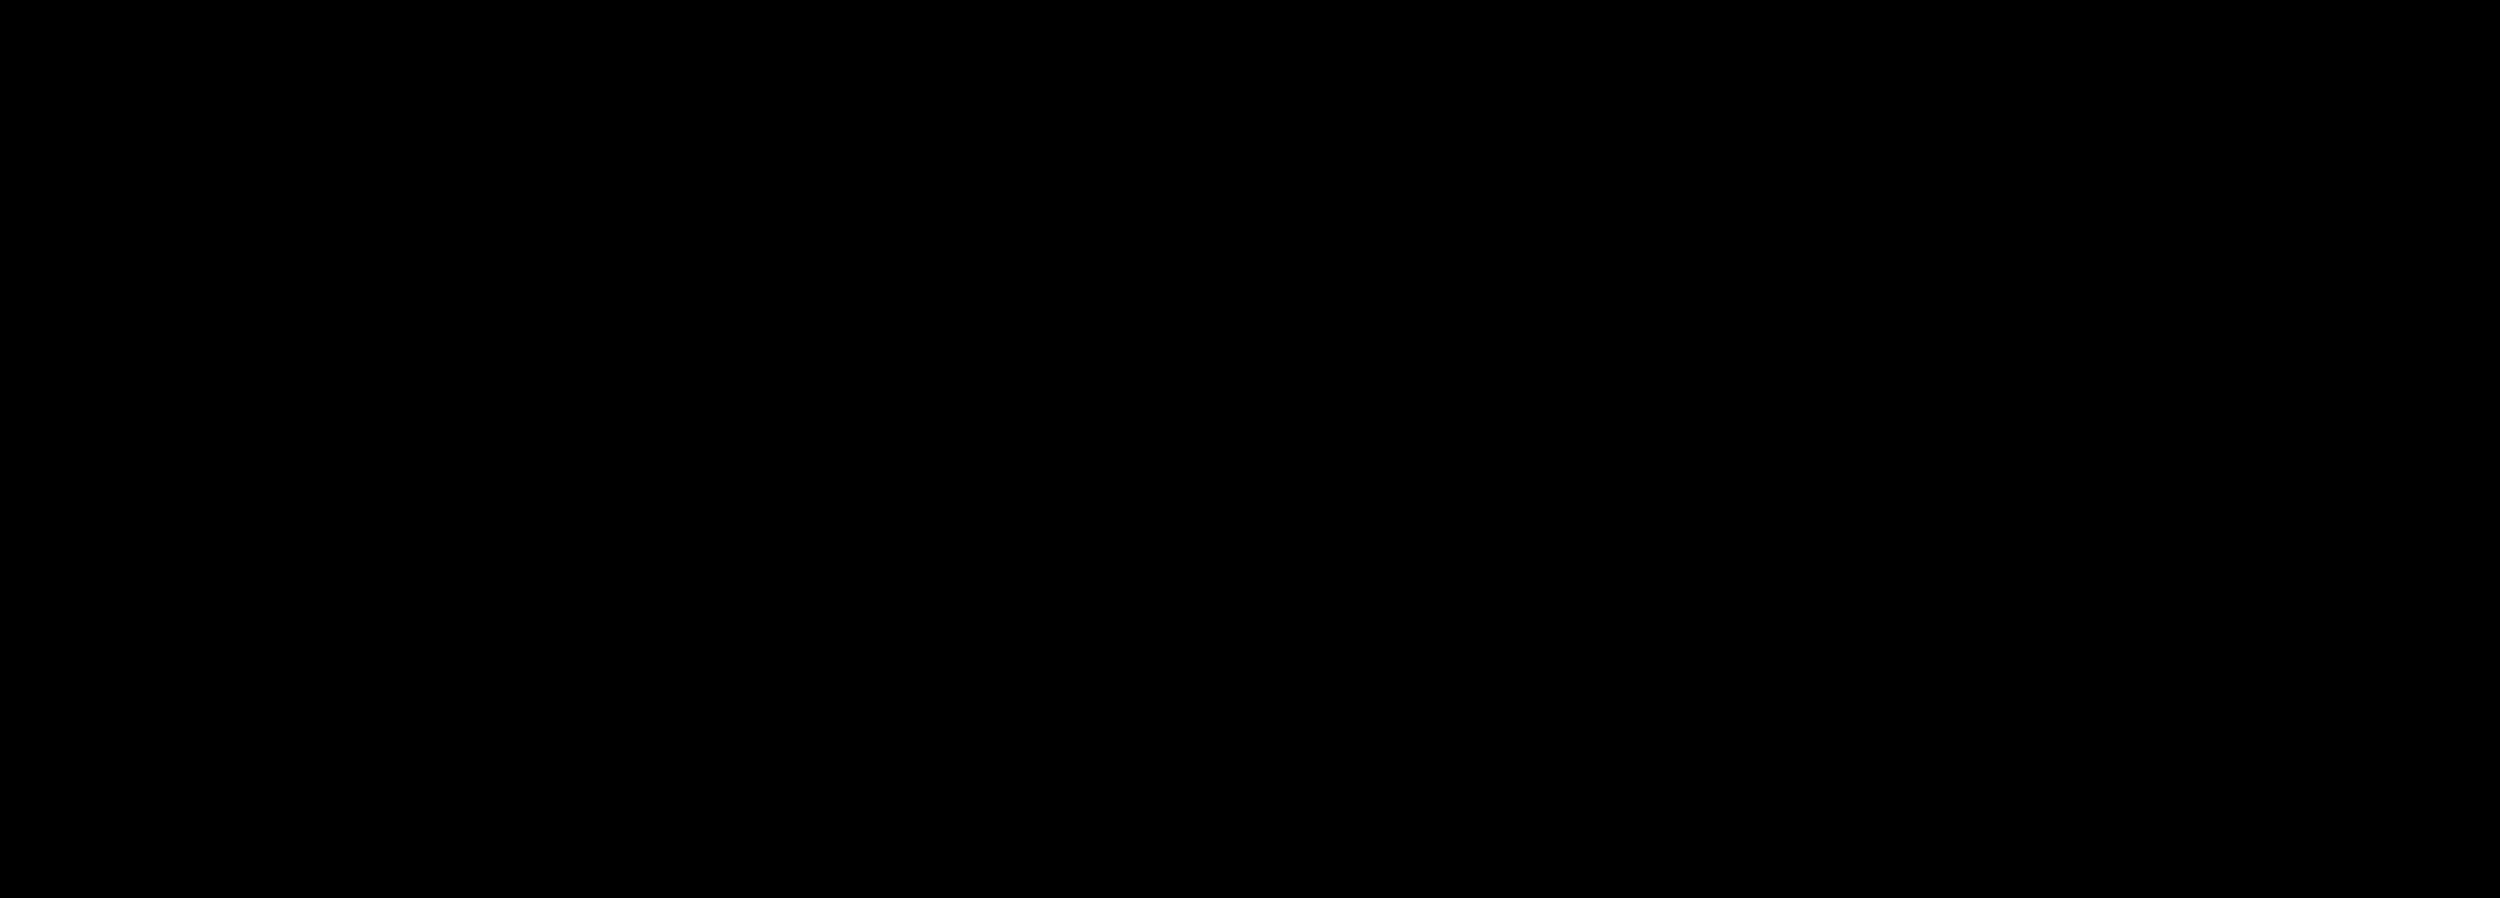 moshuro logo (1).png